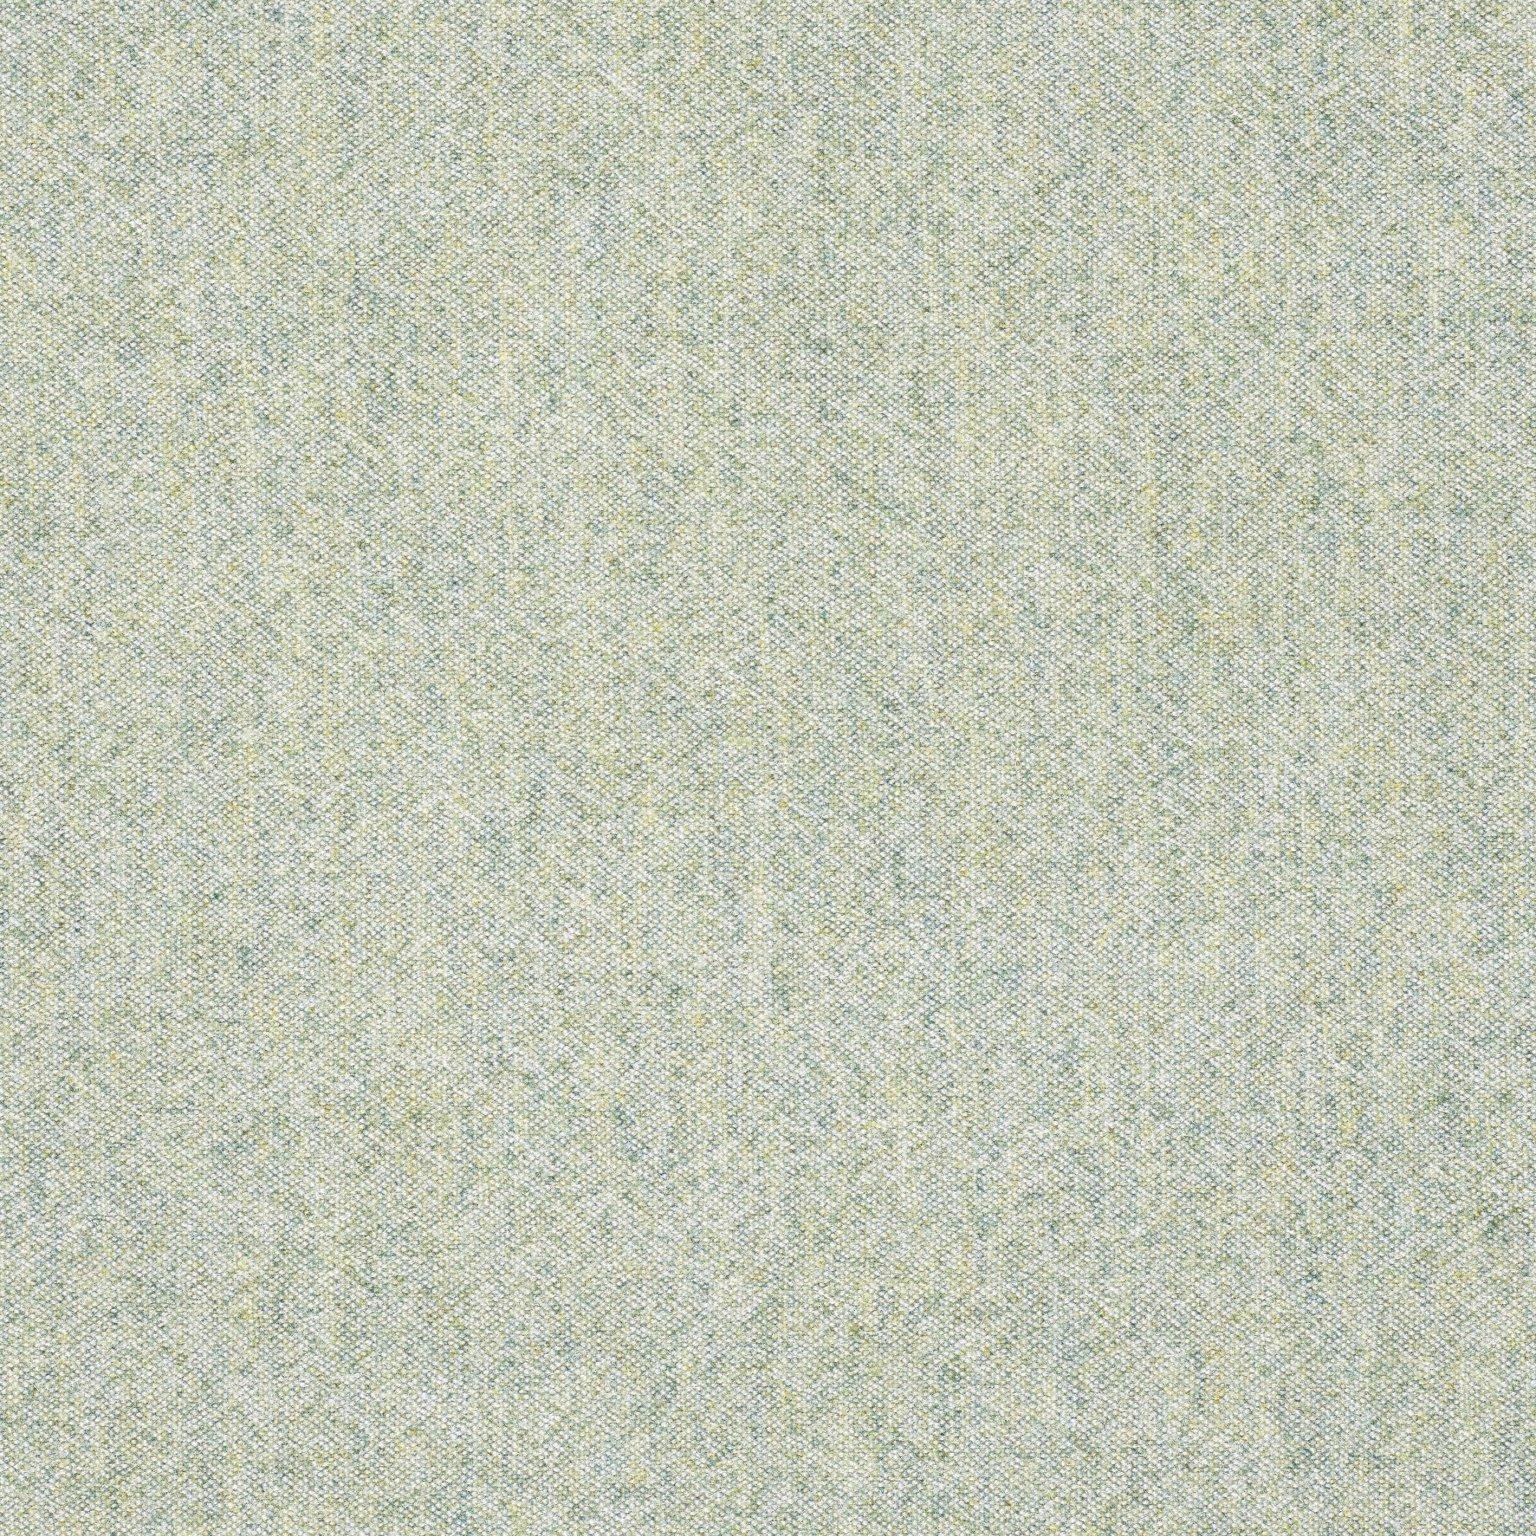 Kvadrat > Melange Nap 0911